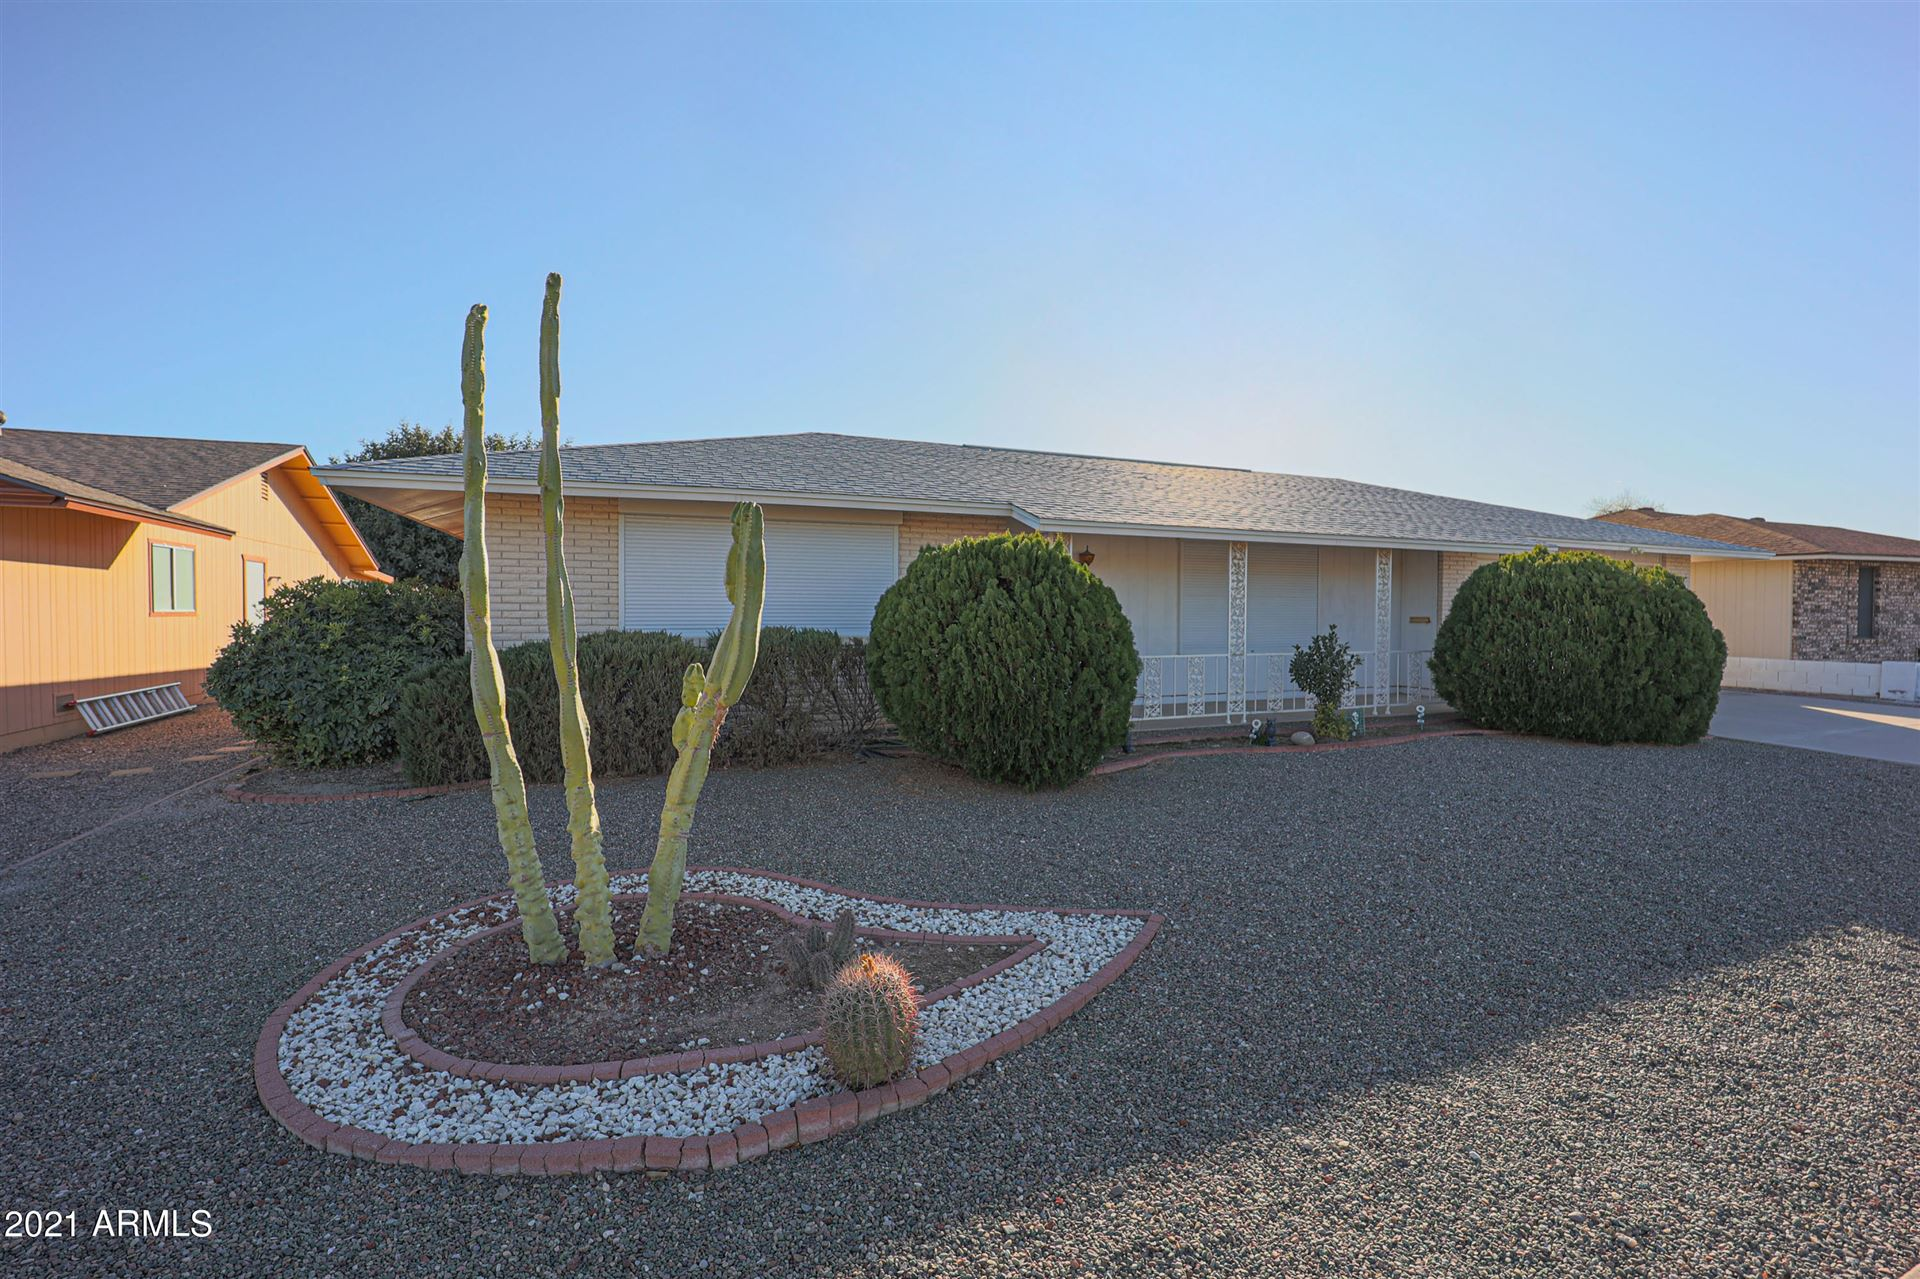 Photo of 10247 W OAK RIDGE Drive, Sun City, AZ 85351 (MLS # 6199424)